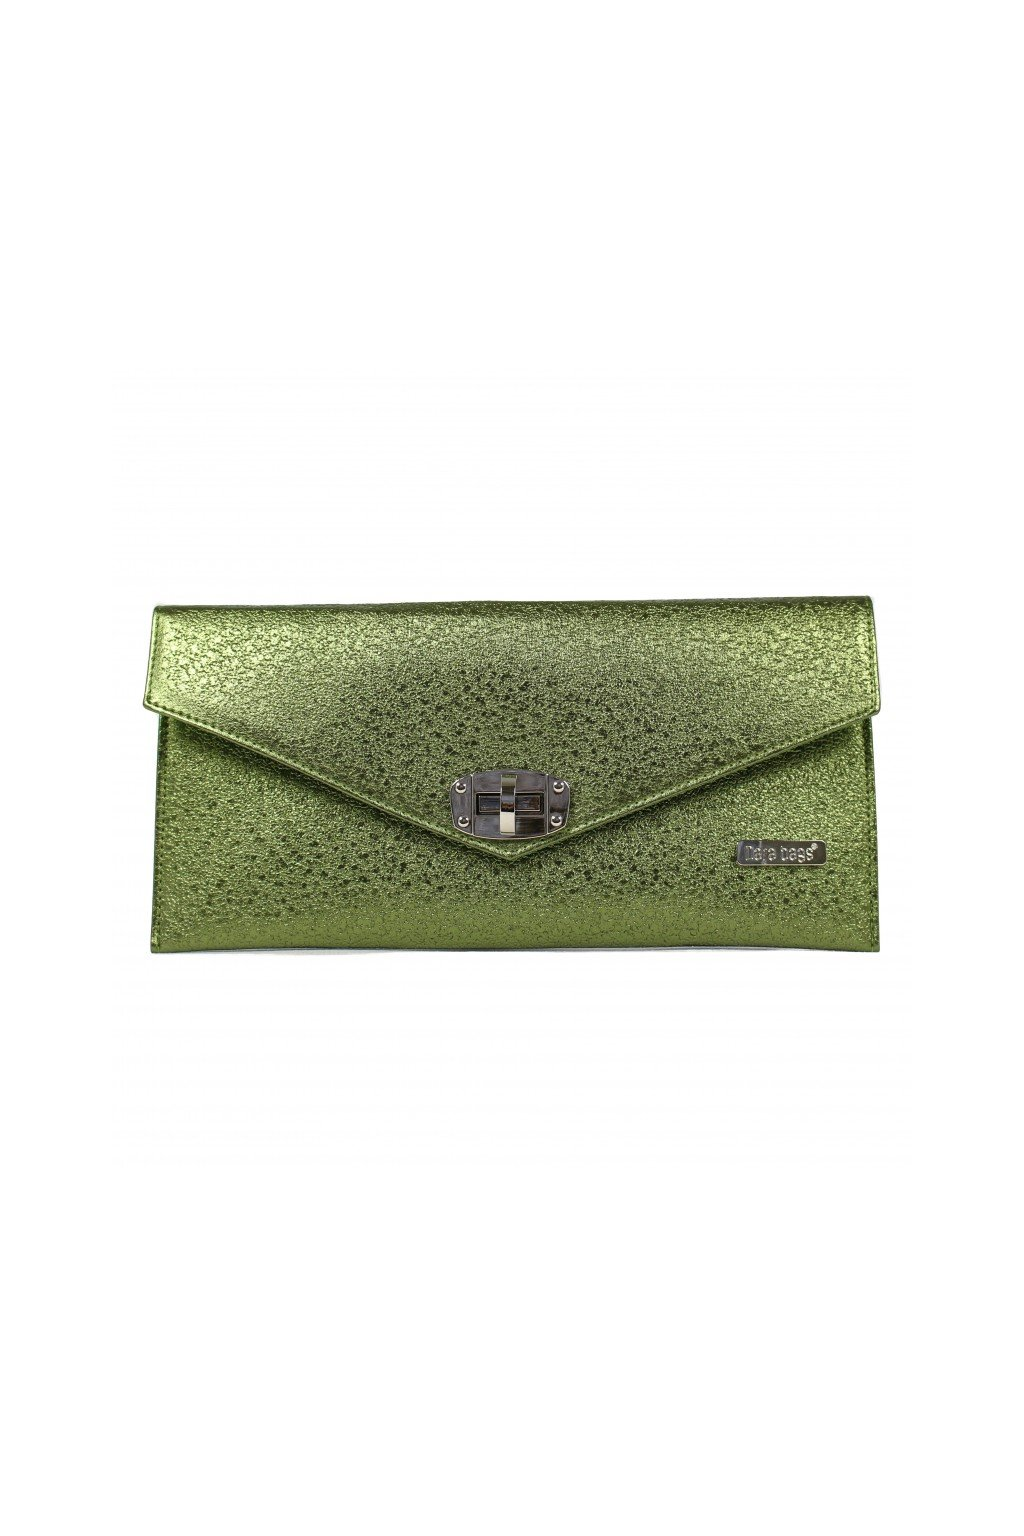 Malá třpytivá kabelka Malibu Classy Dara bags zelená 1